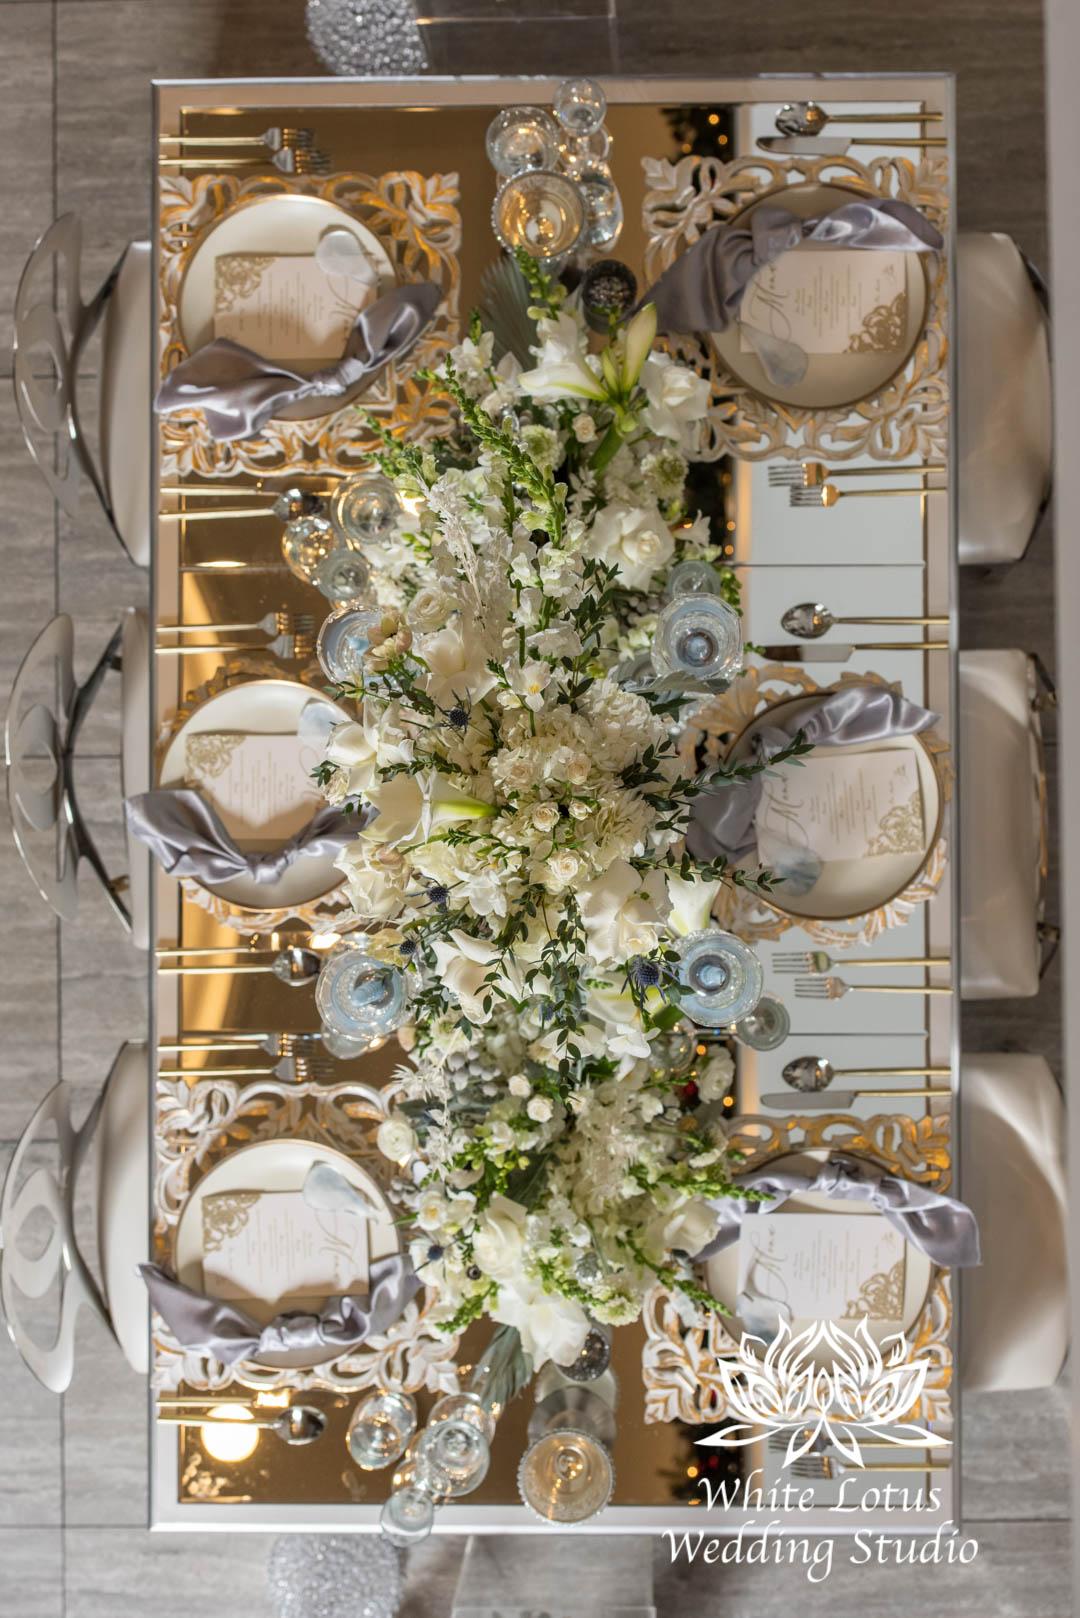 175- GLAM WINTERLUXE WEDDING INSPIRATION